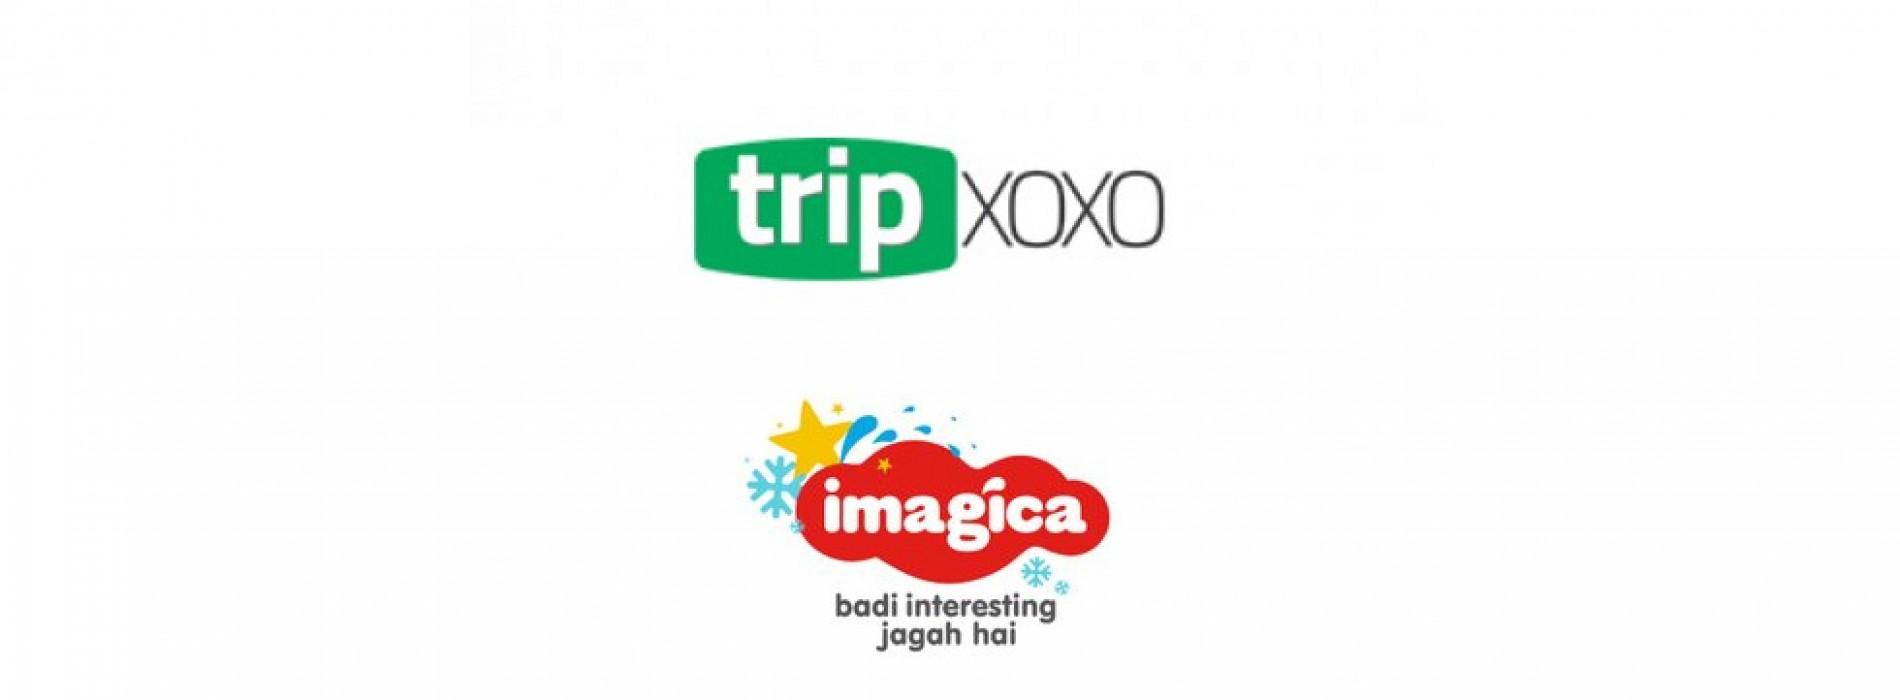 TripXOXO ties-up with Imagica